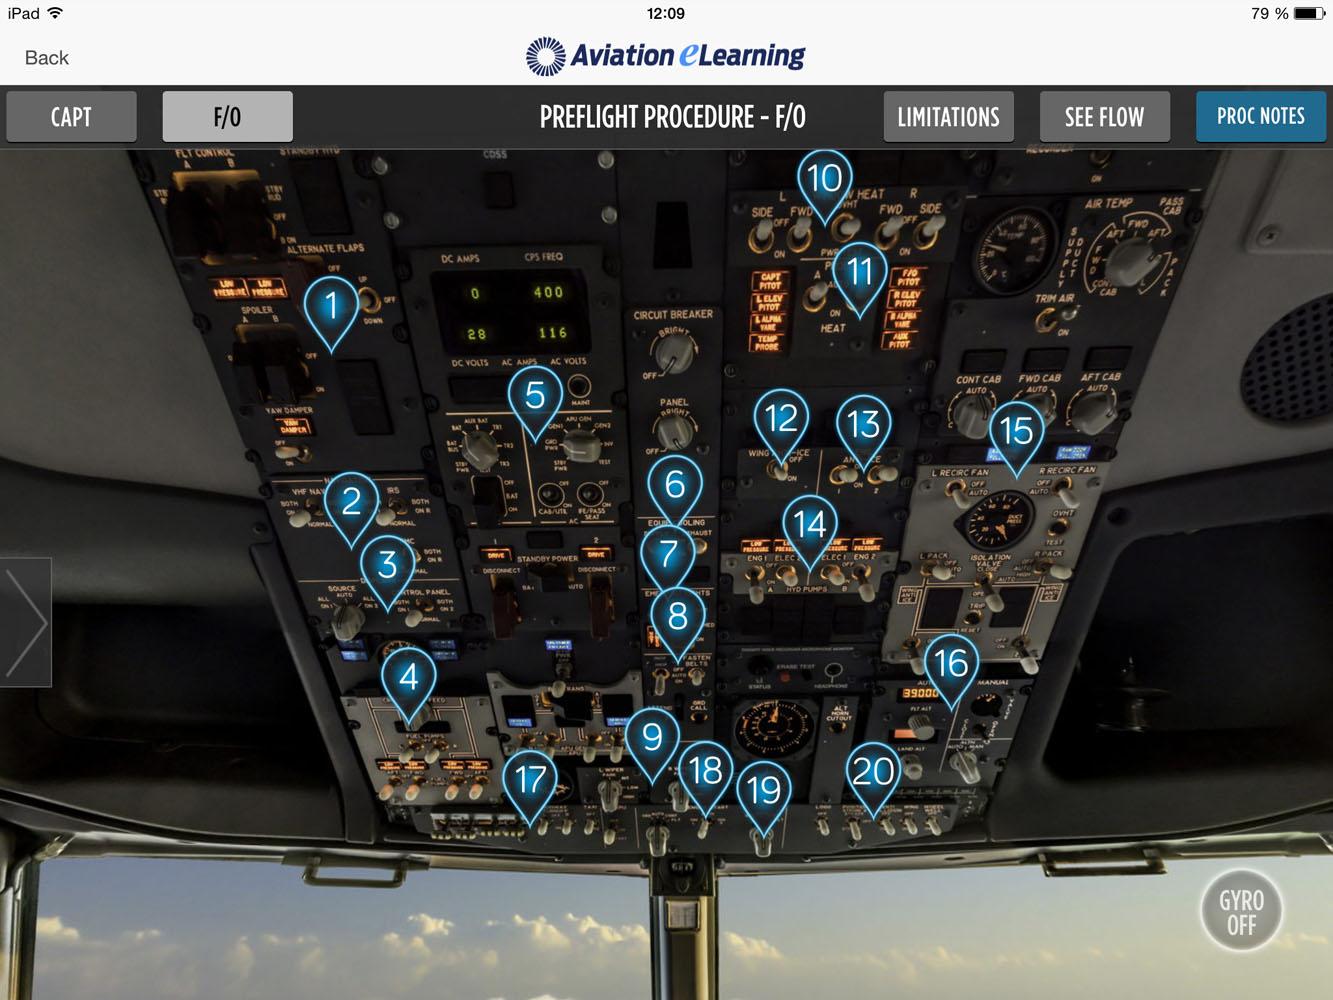 Boeing B737NG Normal Procedures